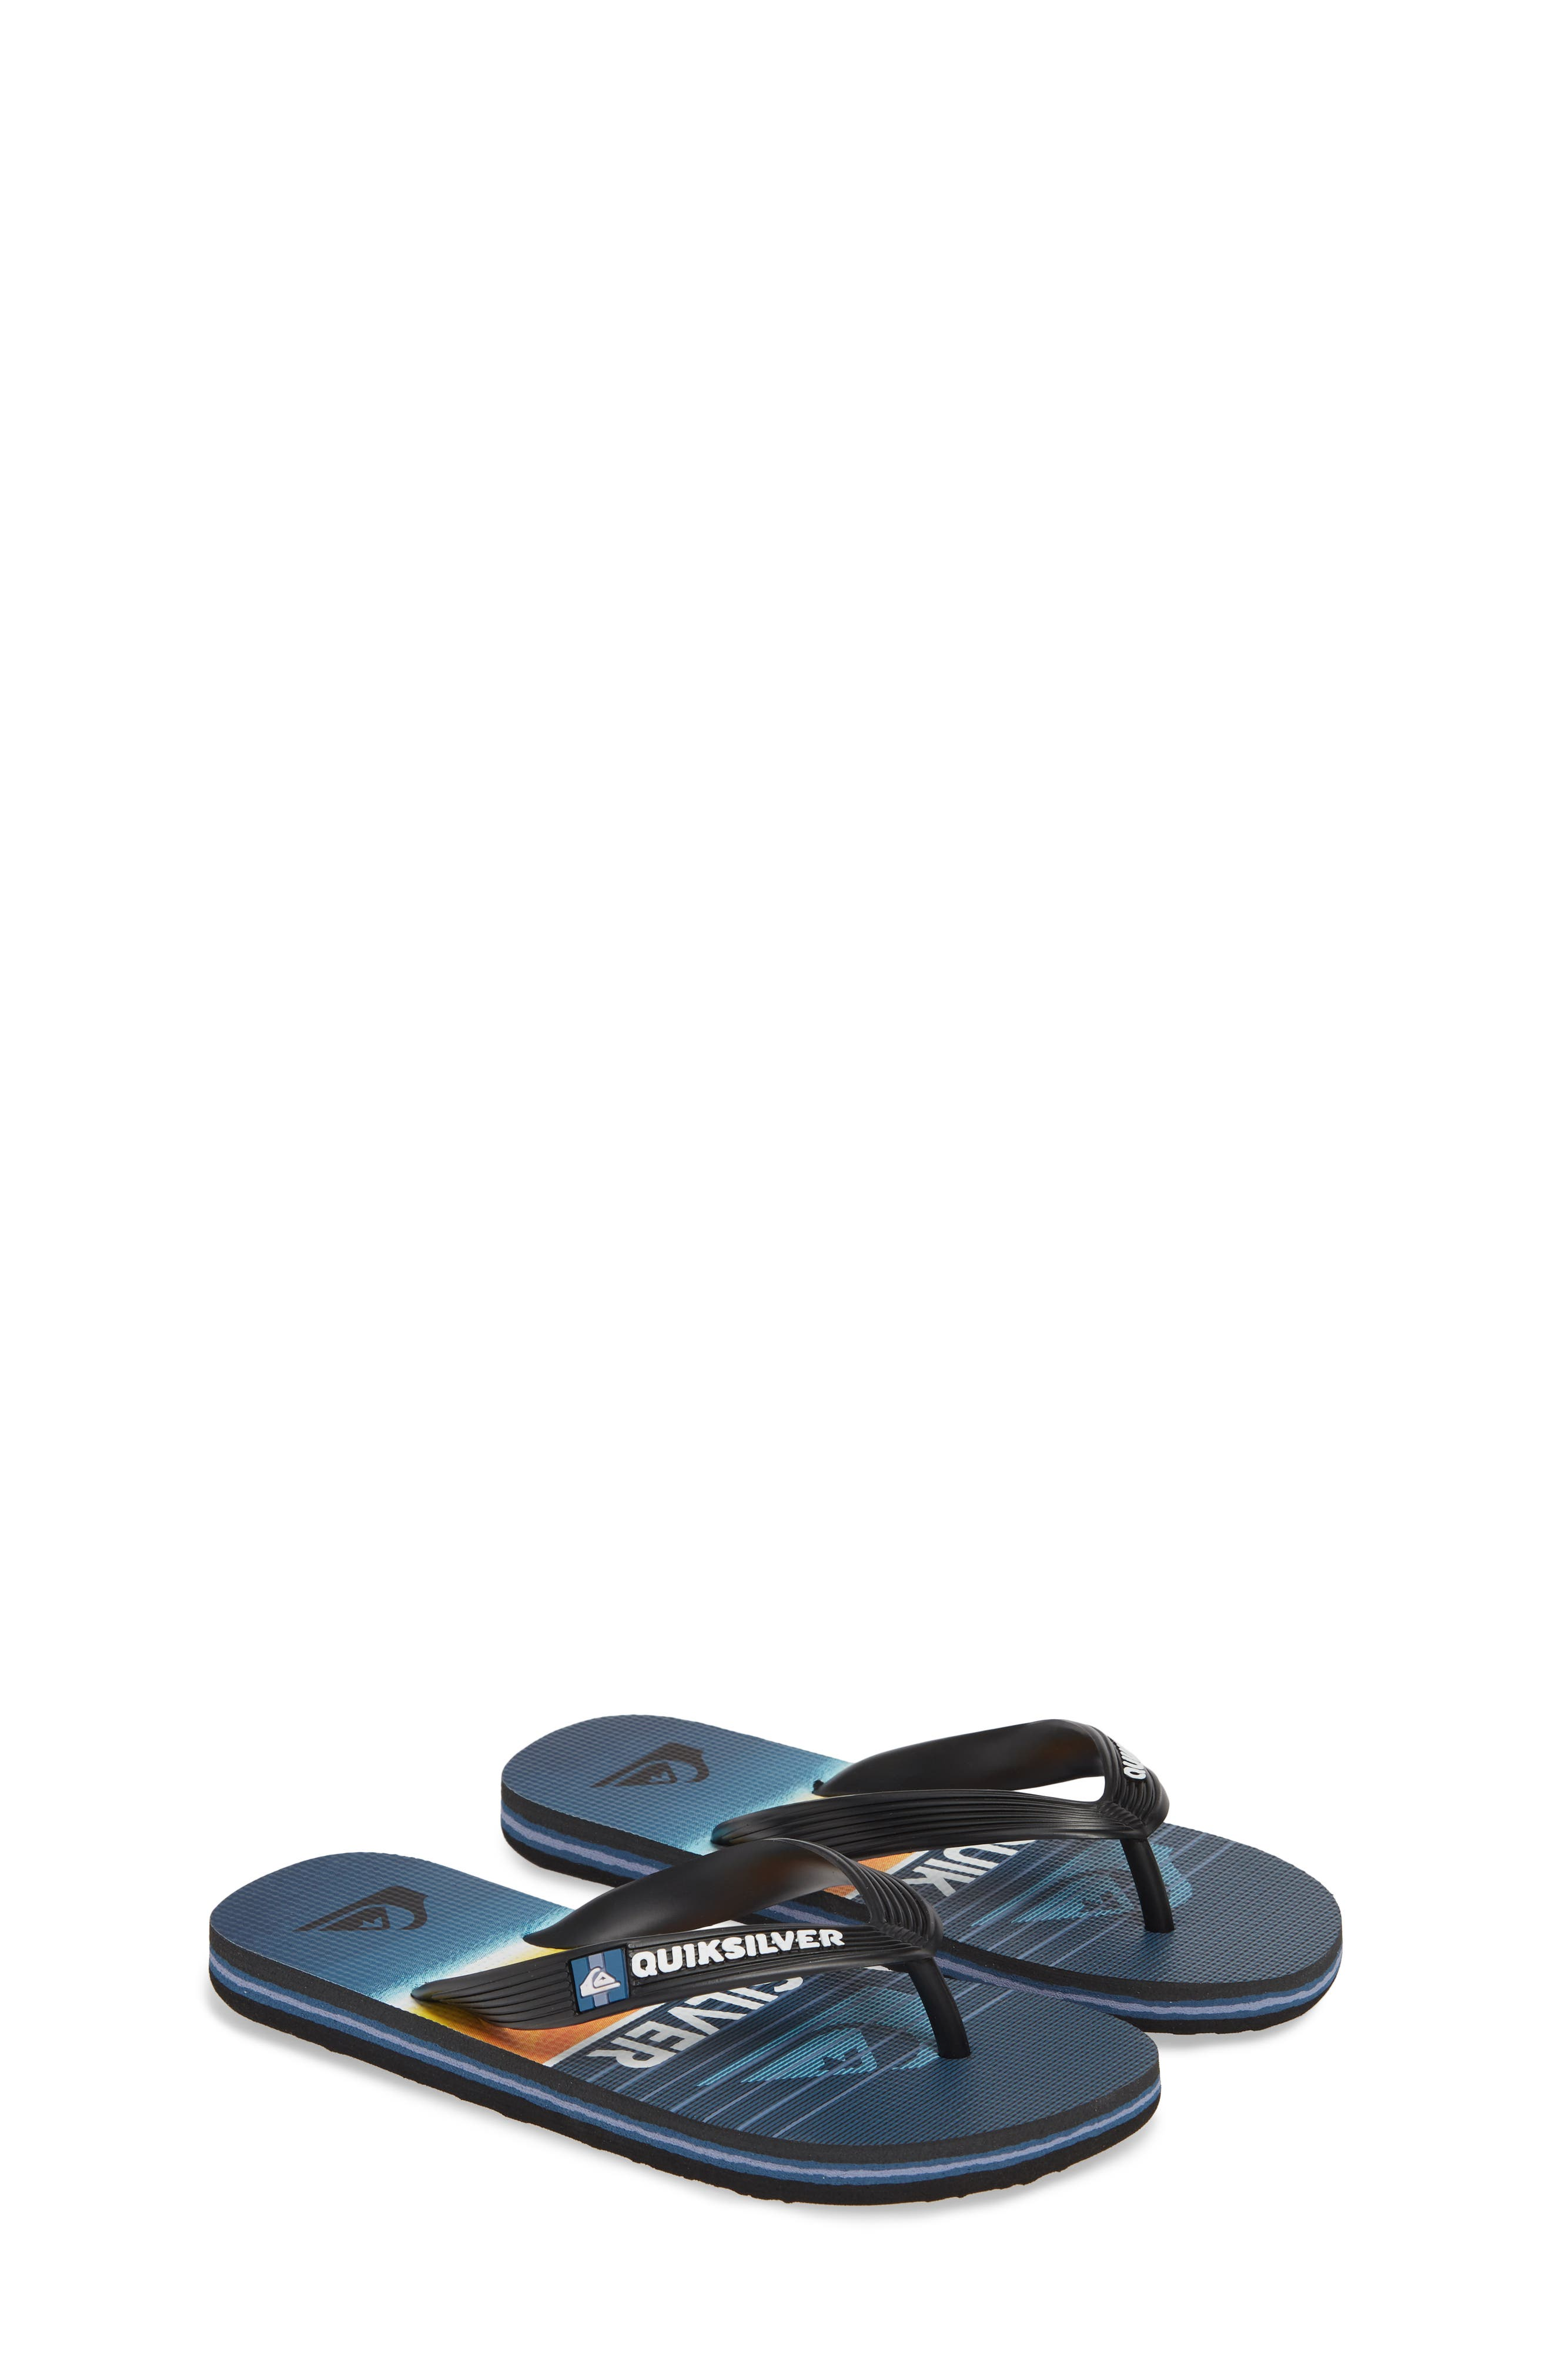 QUIKSILVER, Highline Slab Flip Flop, Alternate thumbnail 2, color, BLACK/ BLUE/ BLUE